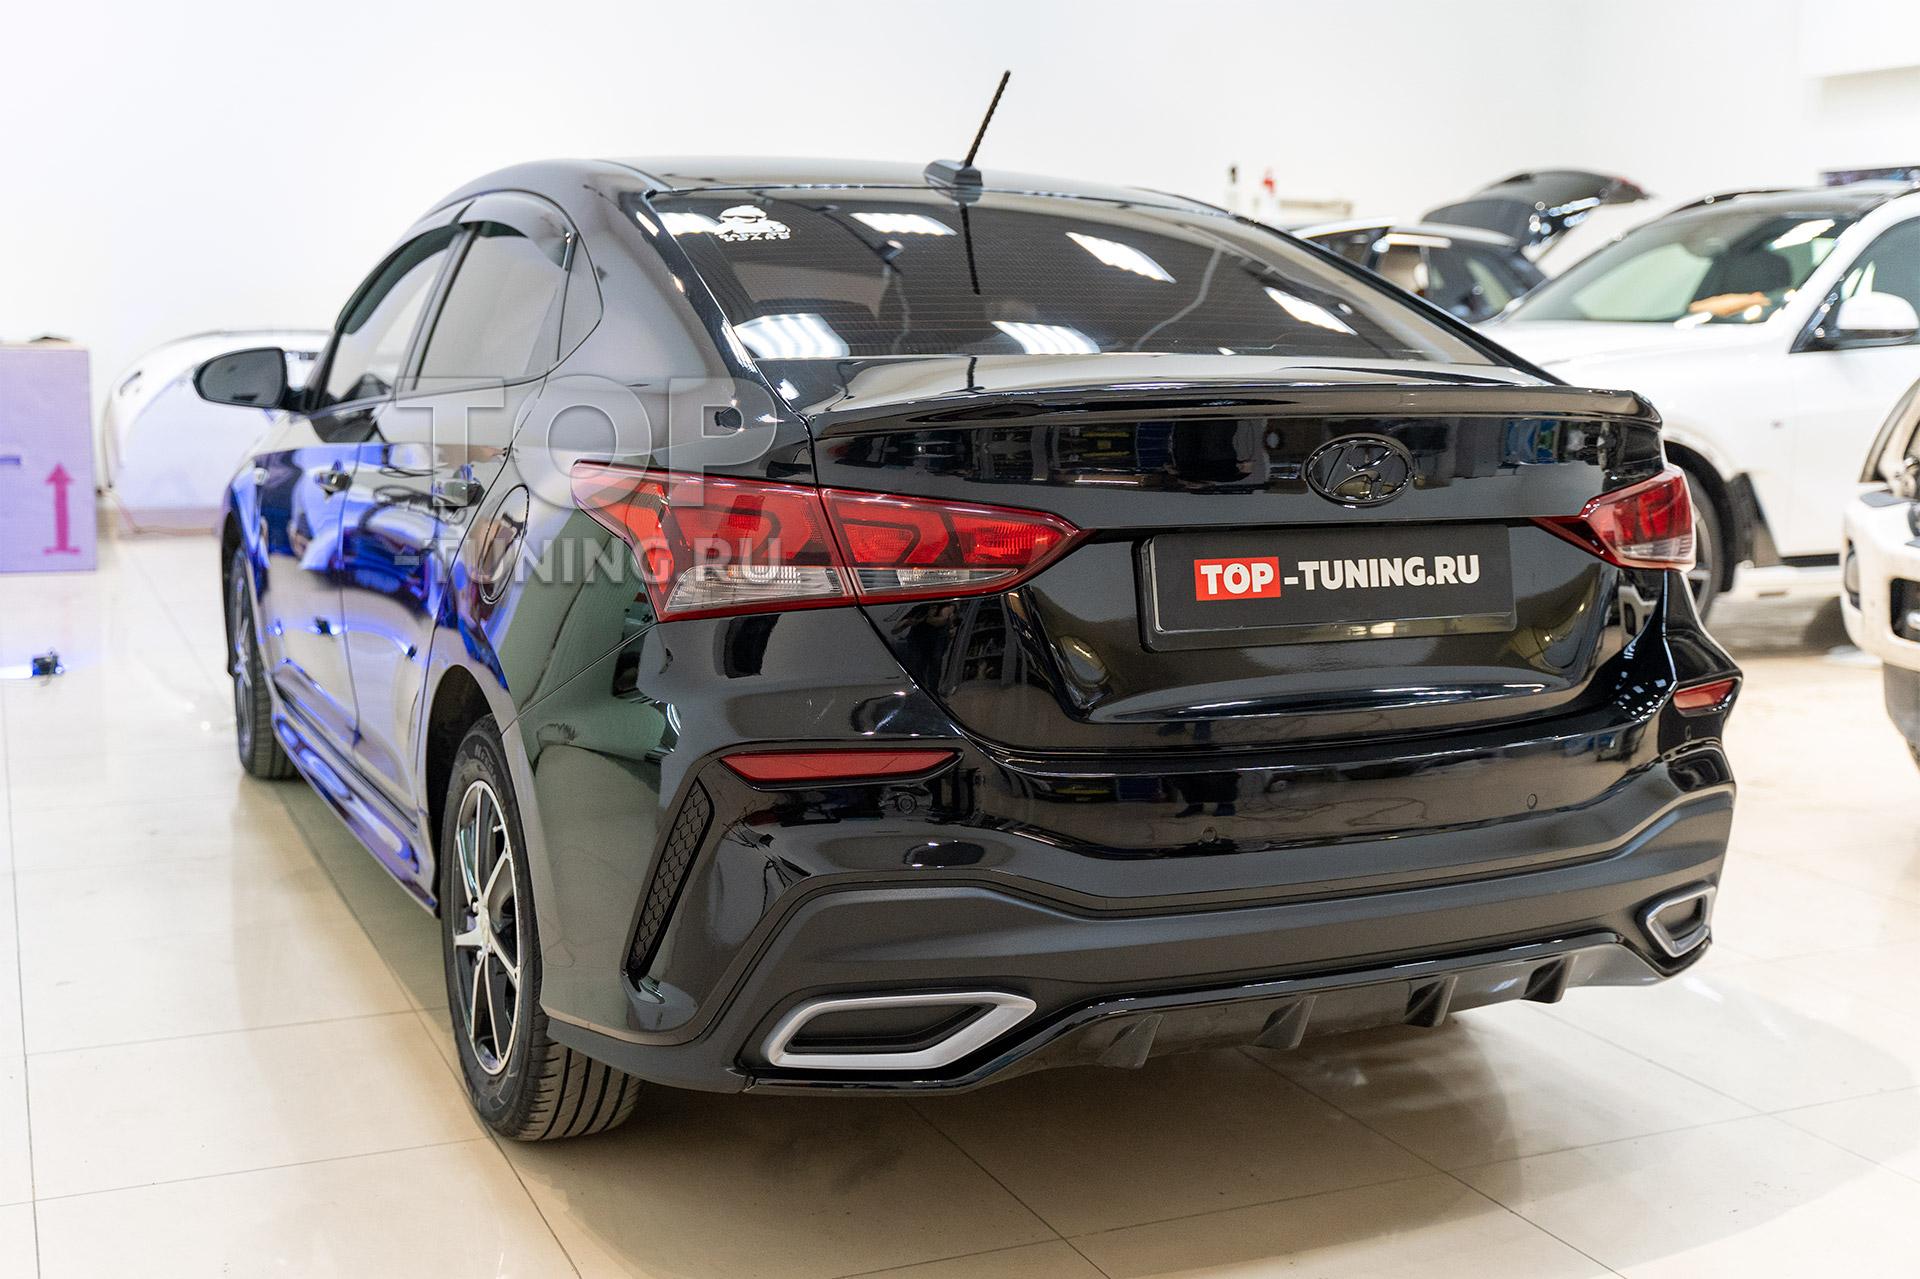 Тюнинг Хендай Солярис 2 – Обвес Stinger GT – Задний бампер и спойлер